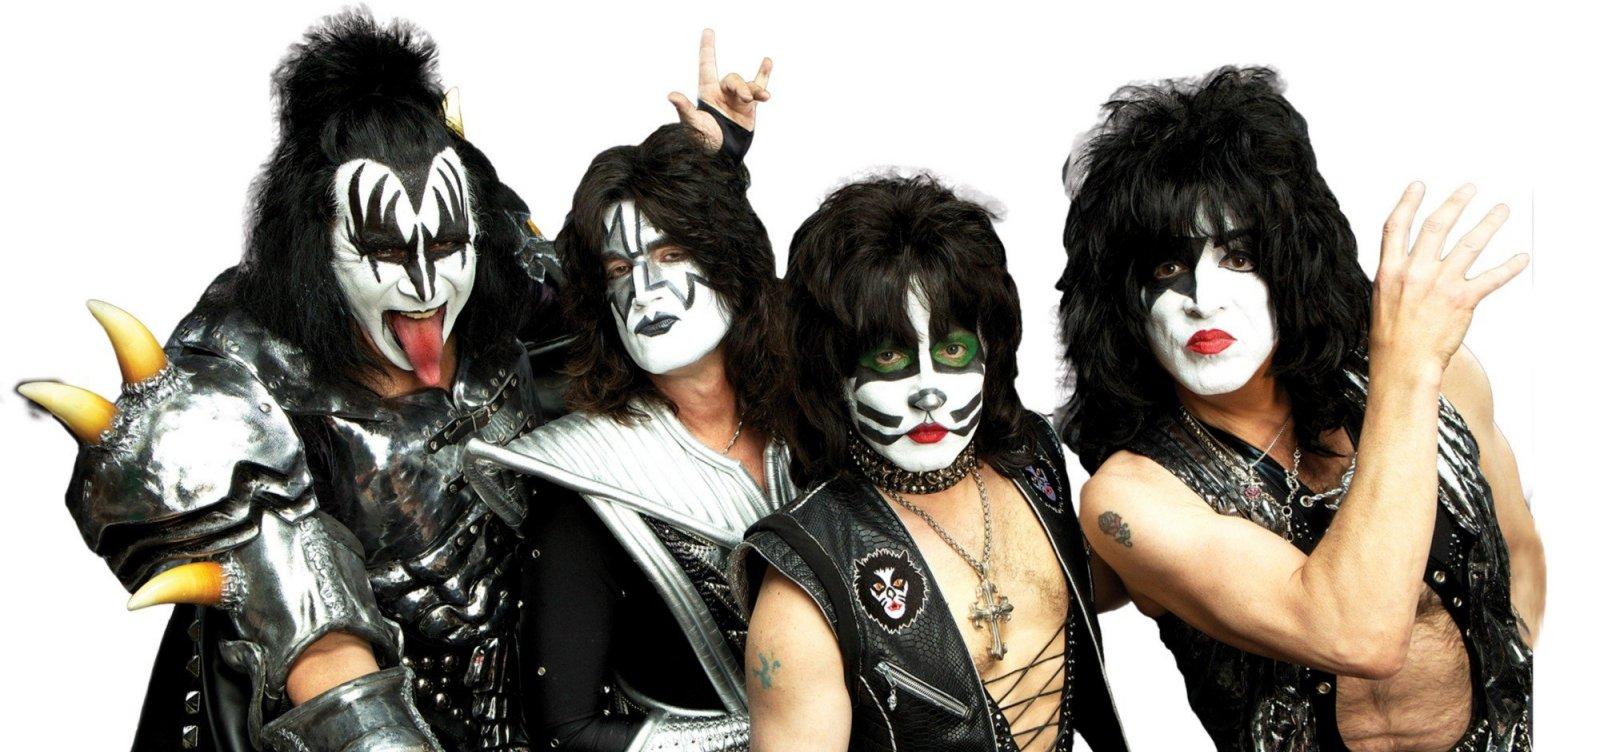 Kiss anuncia turnê de despedida: 'Queremos parar no auge'